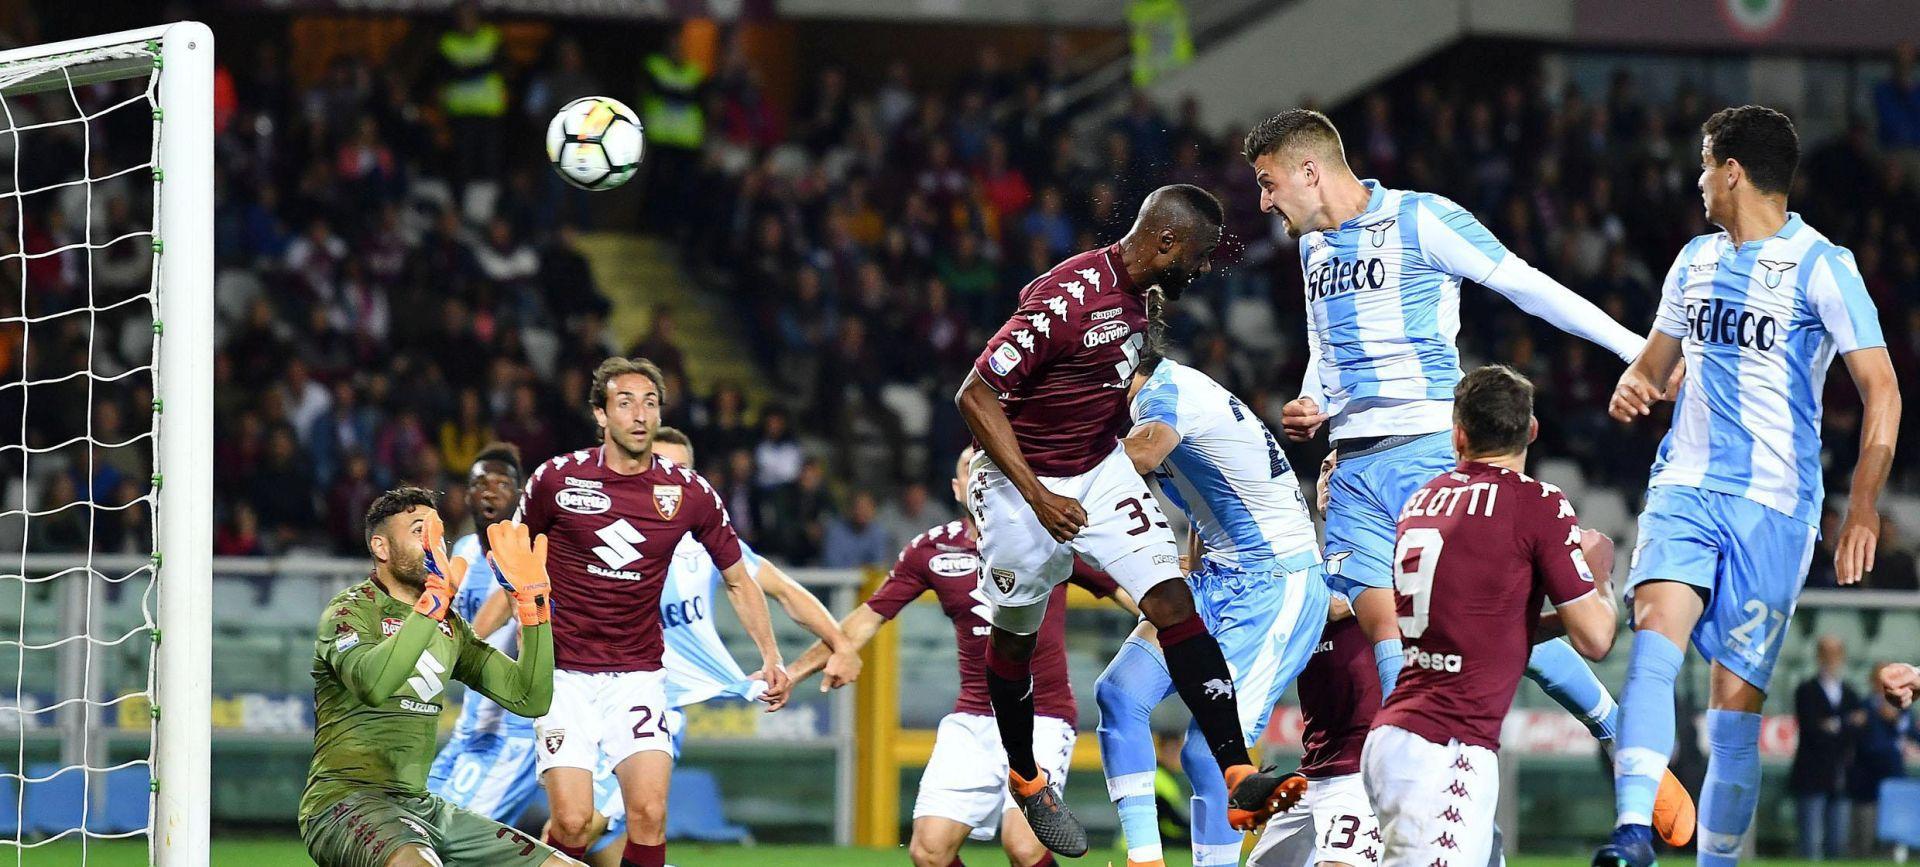 VIDEO: Lazio golom Milinkovića-Savića 'srušio' Torino